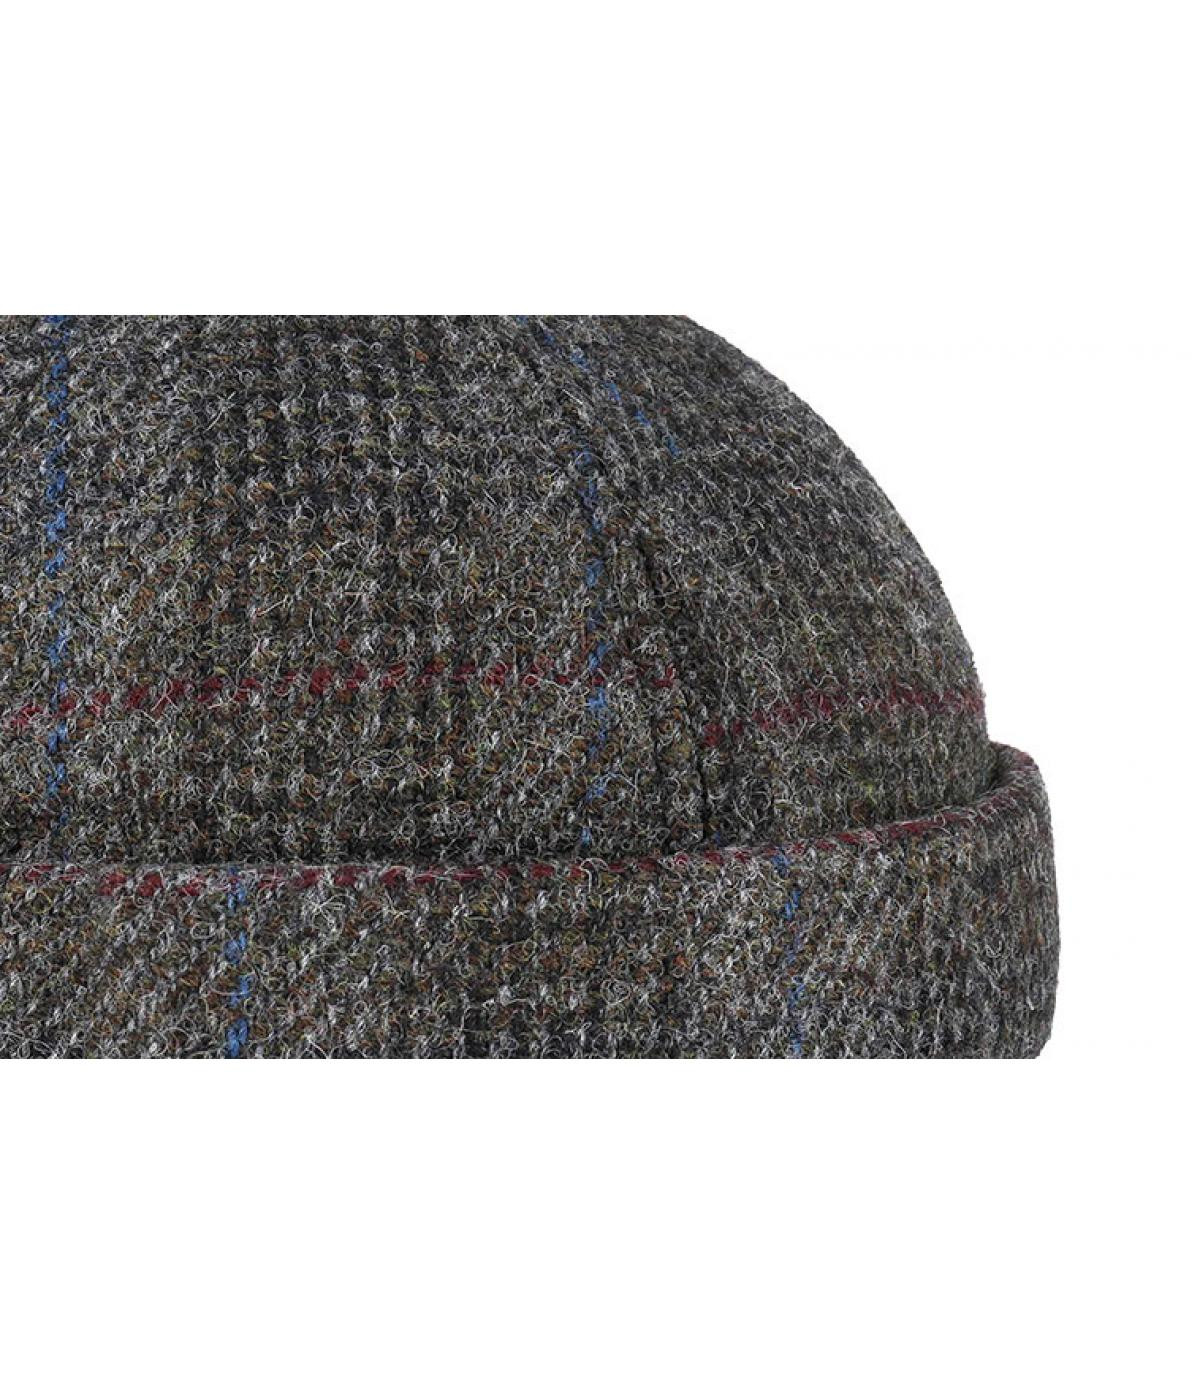 Details Docker Harris Tweed Virgin Wool grey - Abbildung 3